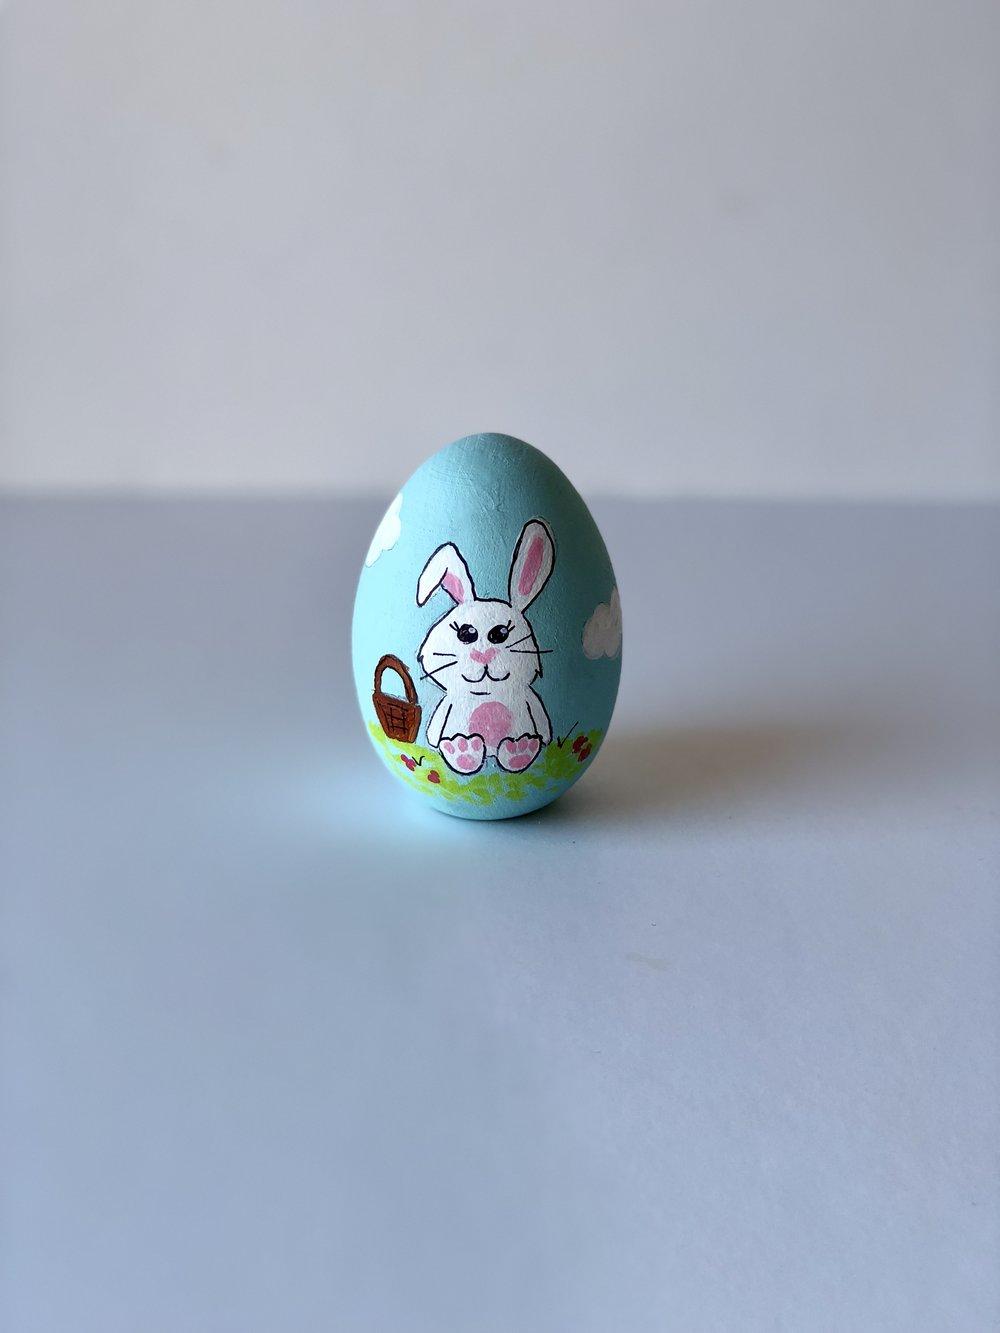 Mandy Cowley - A Festive Happy Bunny.jpg